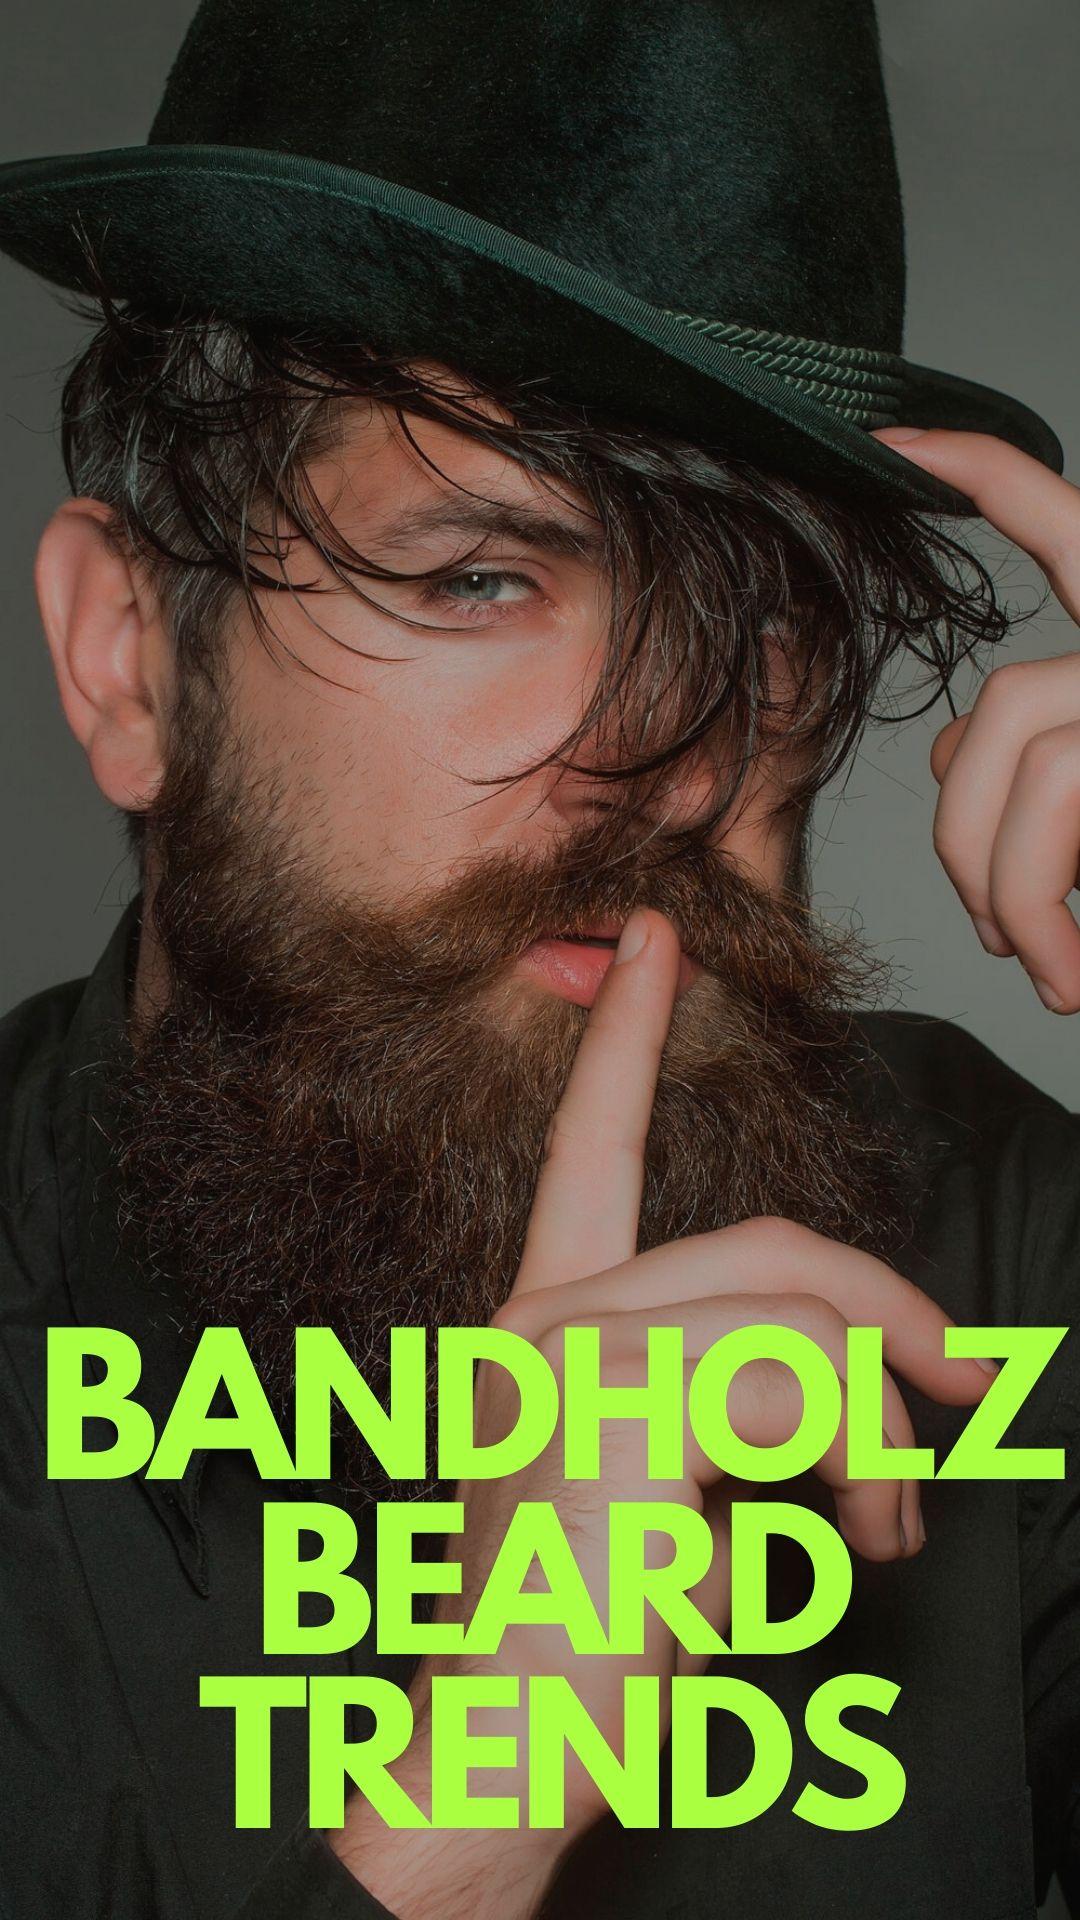 Bandholz Beard Trends of 2020